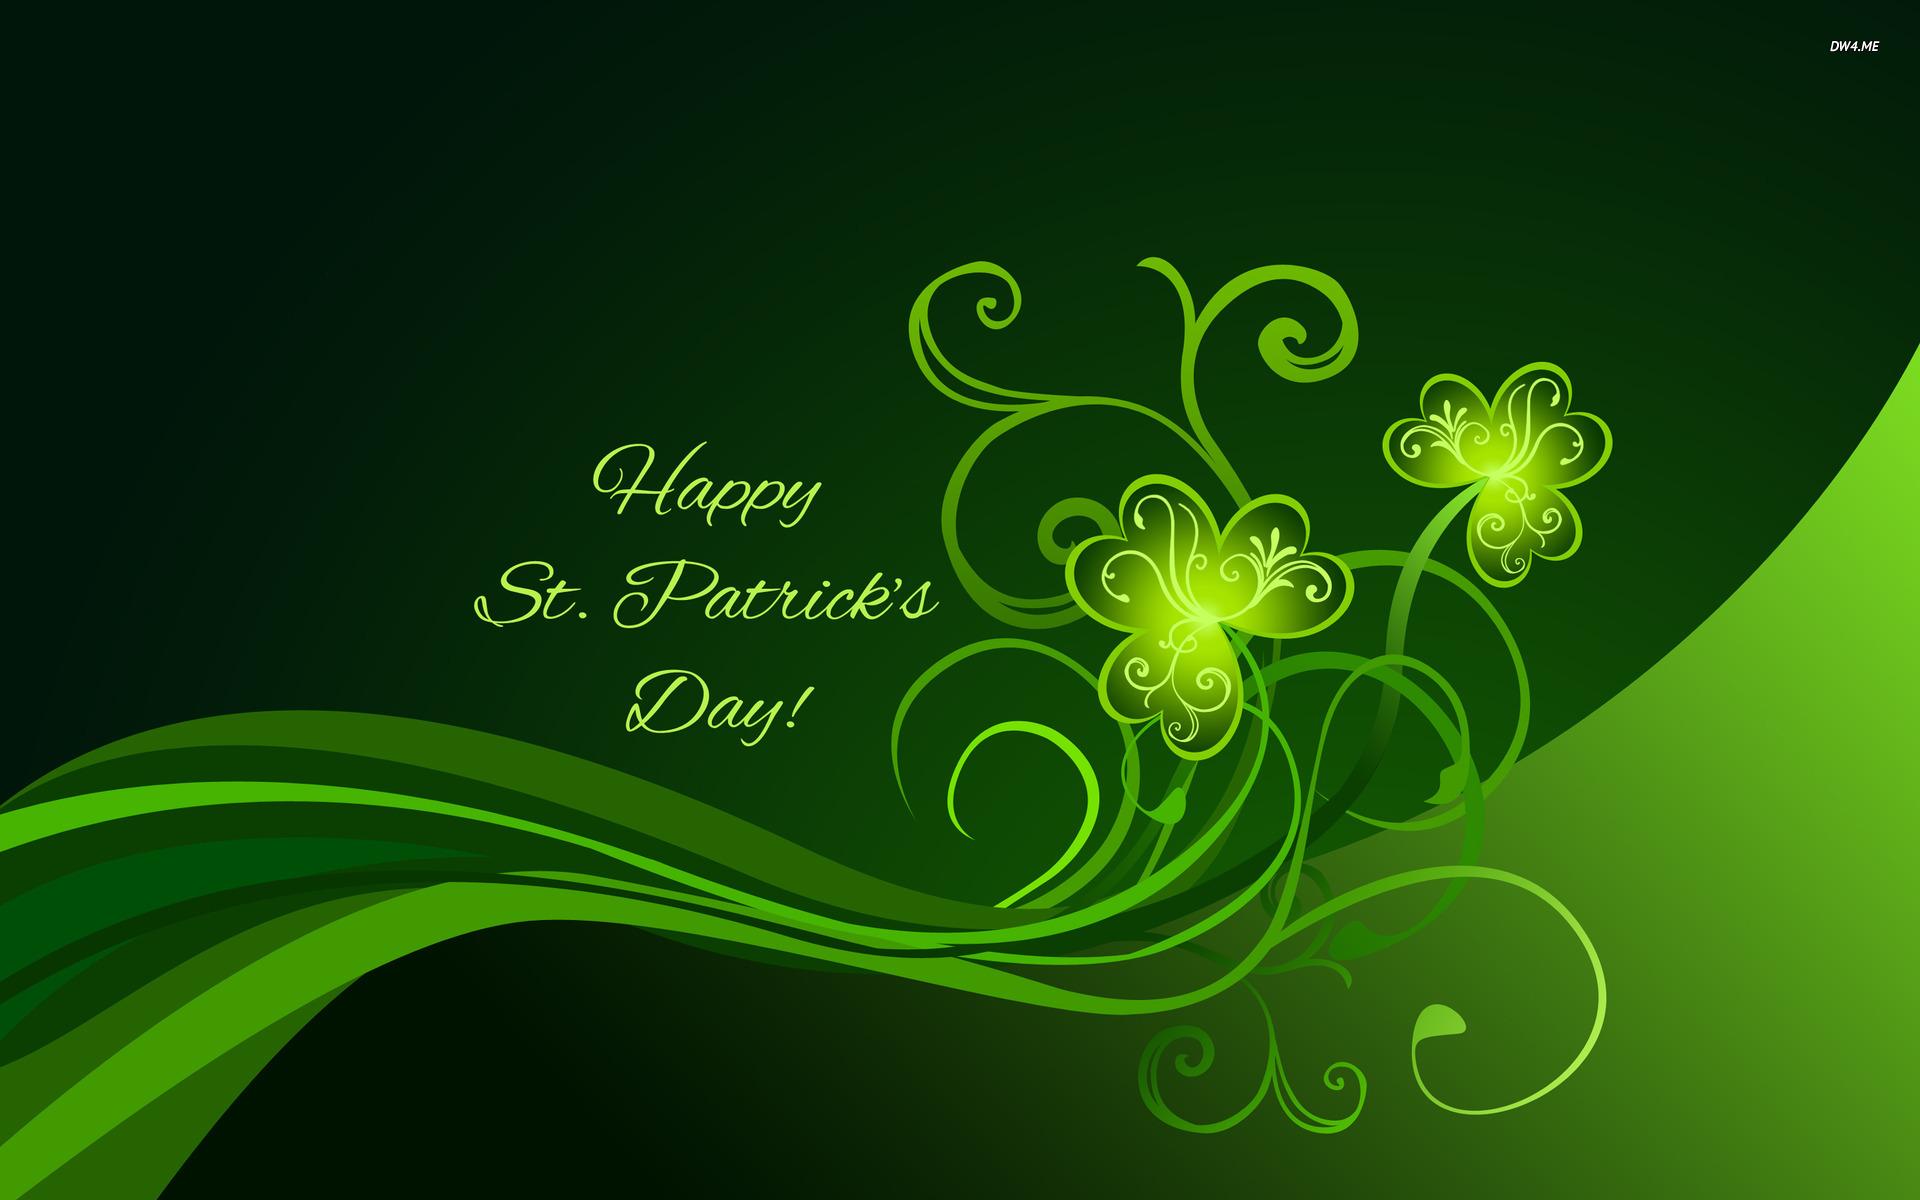 Happy Saint Patrick's Day! wallpaper - Holiday wallpapers - #2157